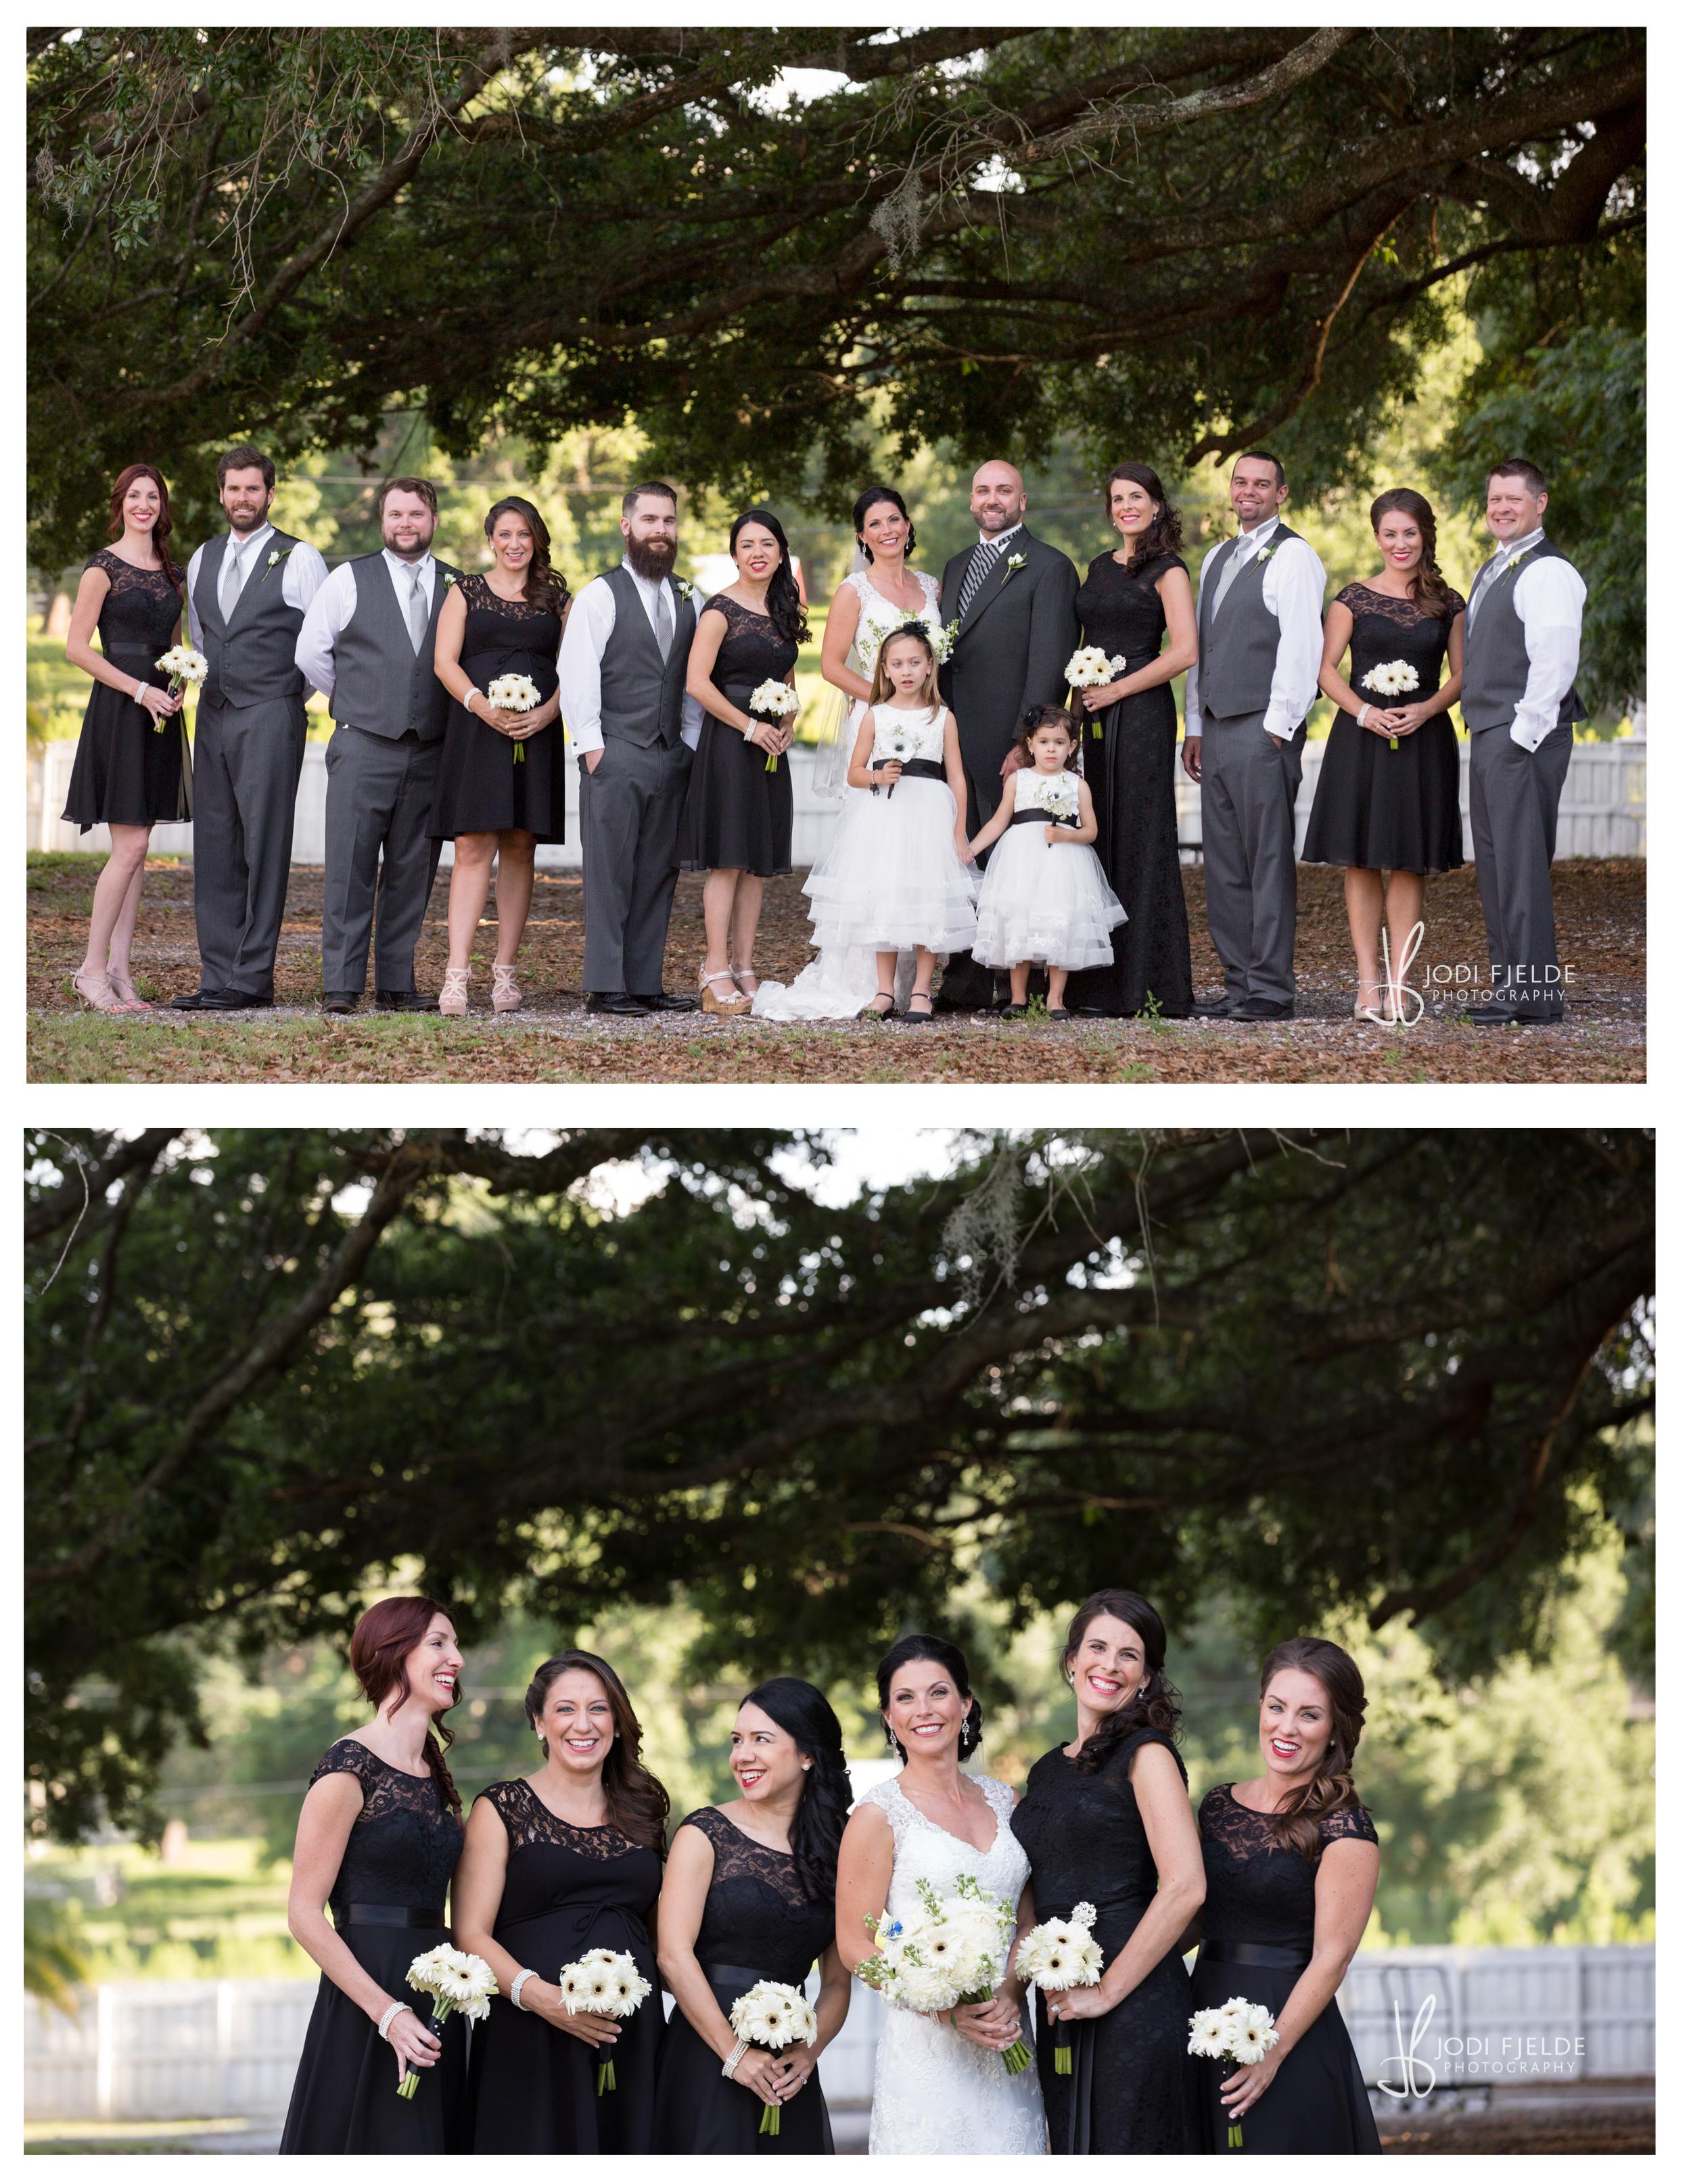 Highland_Manor_Apopka_Florida_wedding_Jackie_&_Tim_photography_jodi_Fjelde_photography-21.jpg